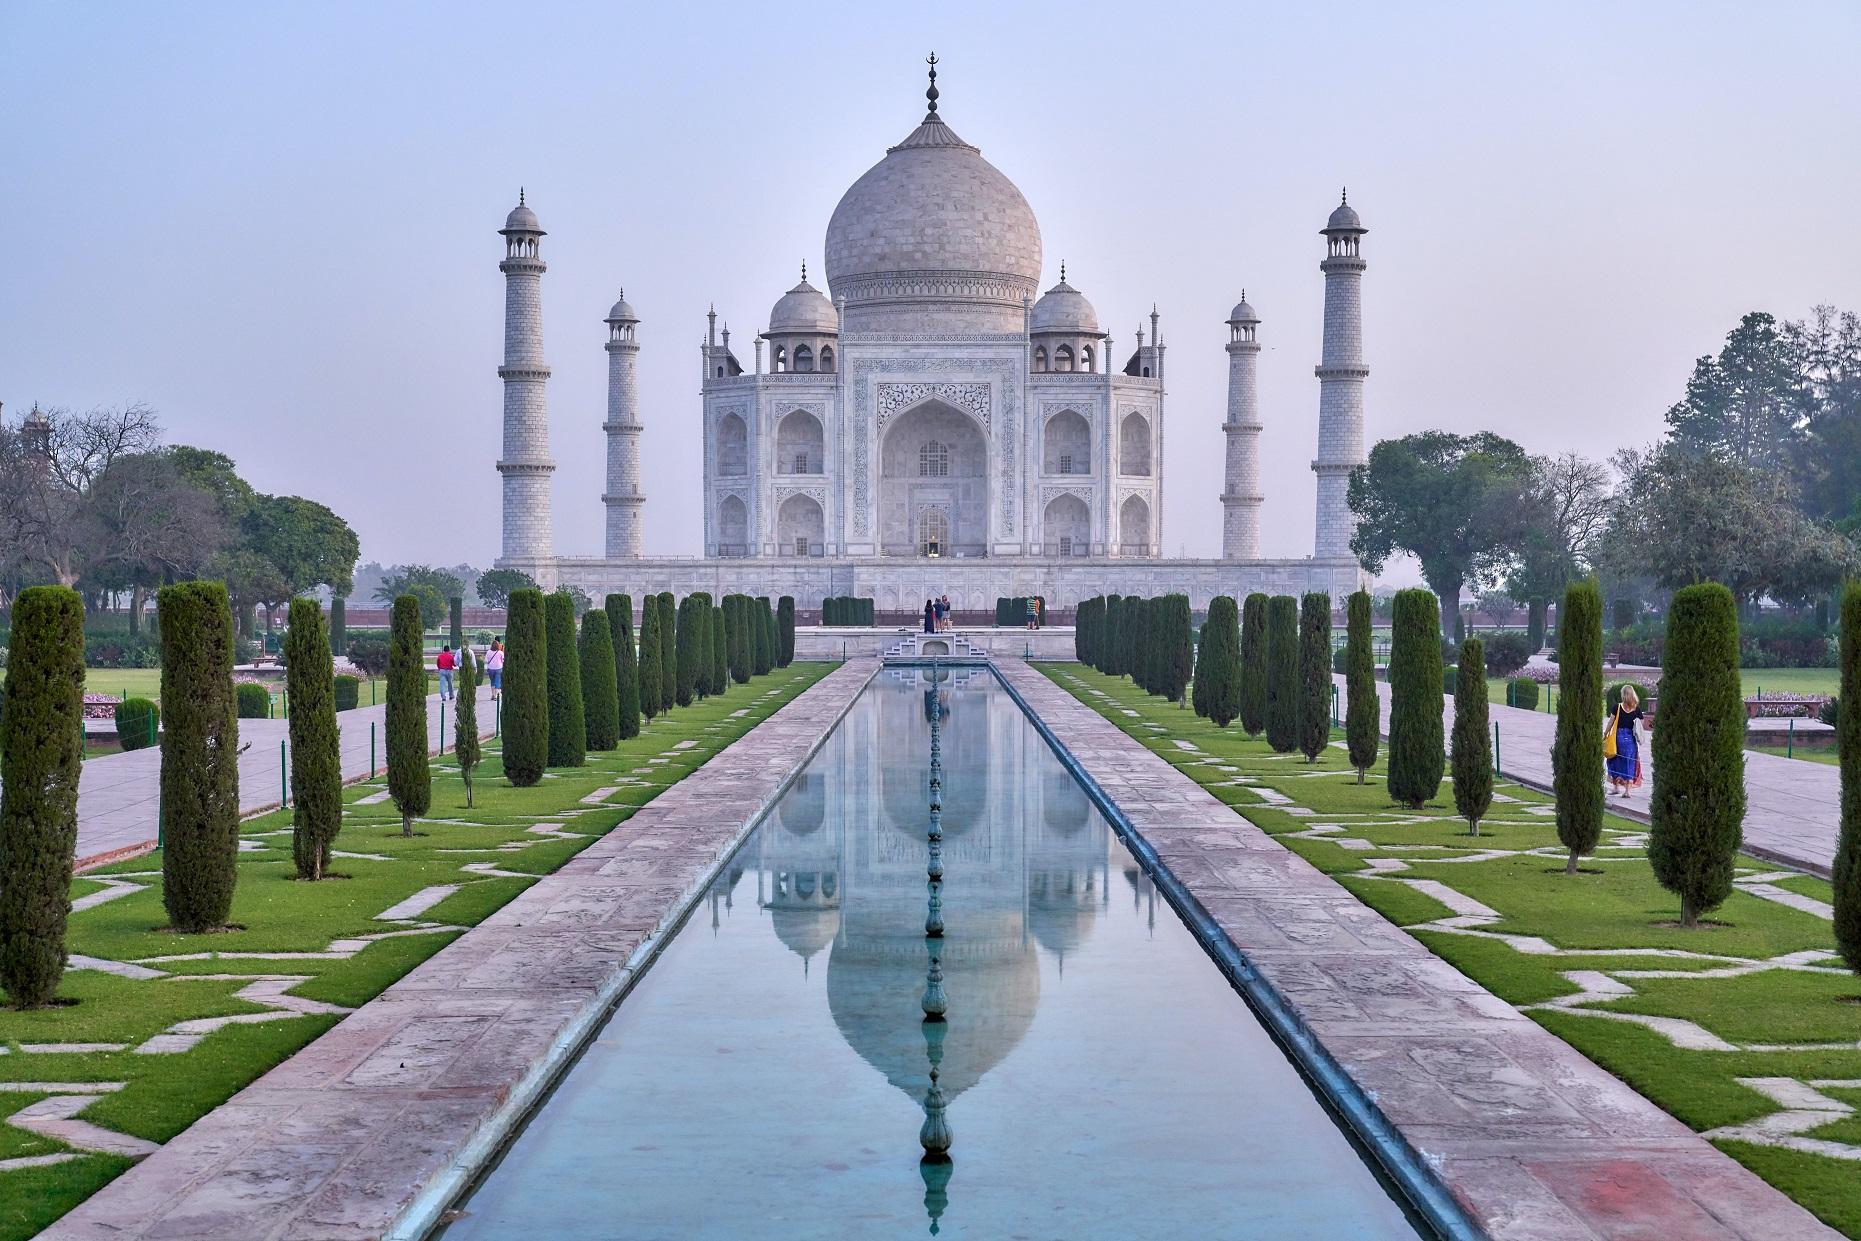 Taj Mahal. Photo by Julian Yu on Unsplash.